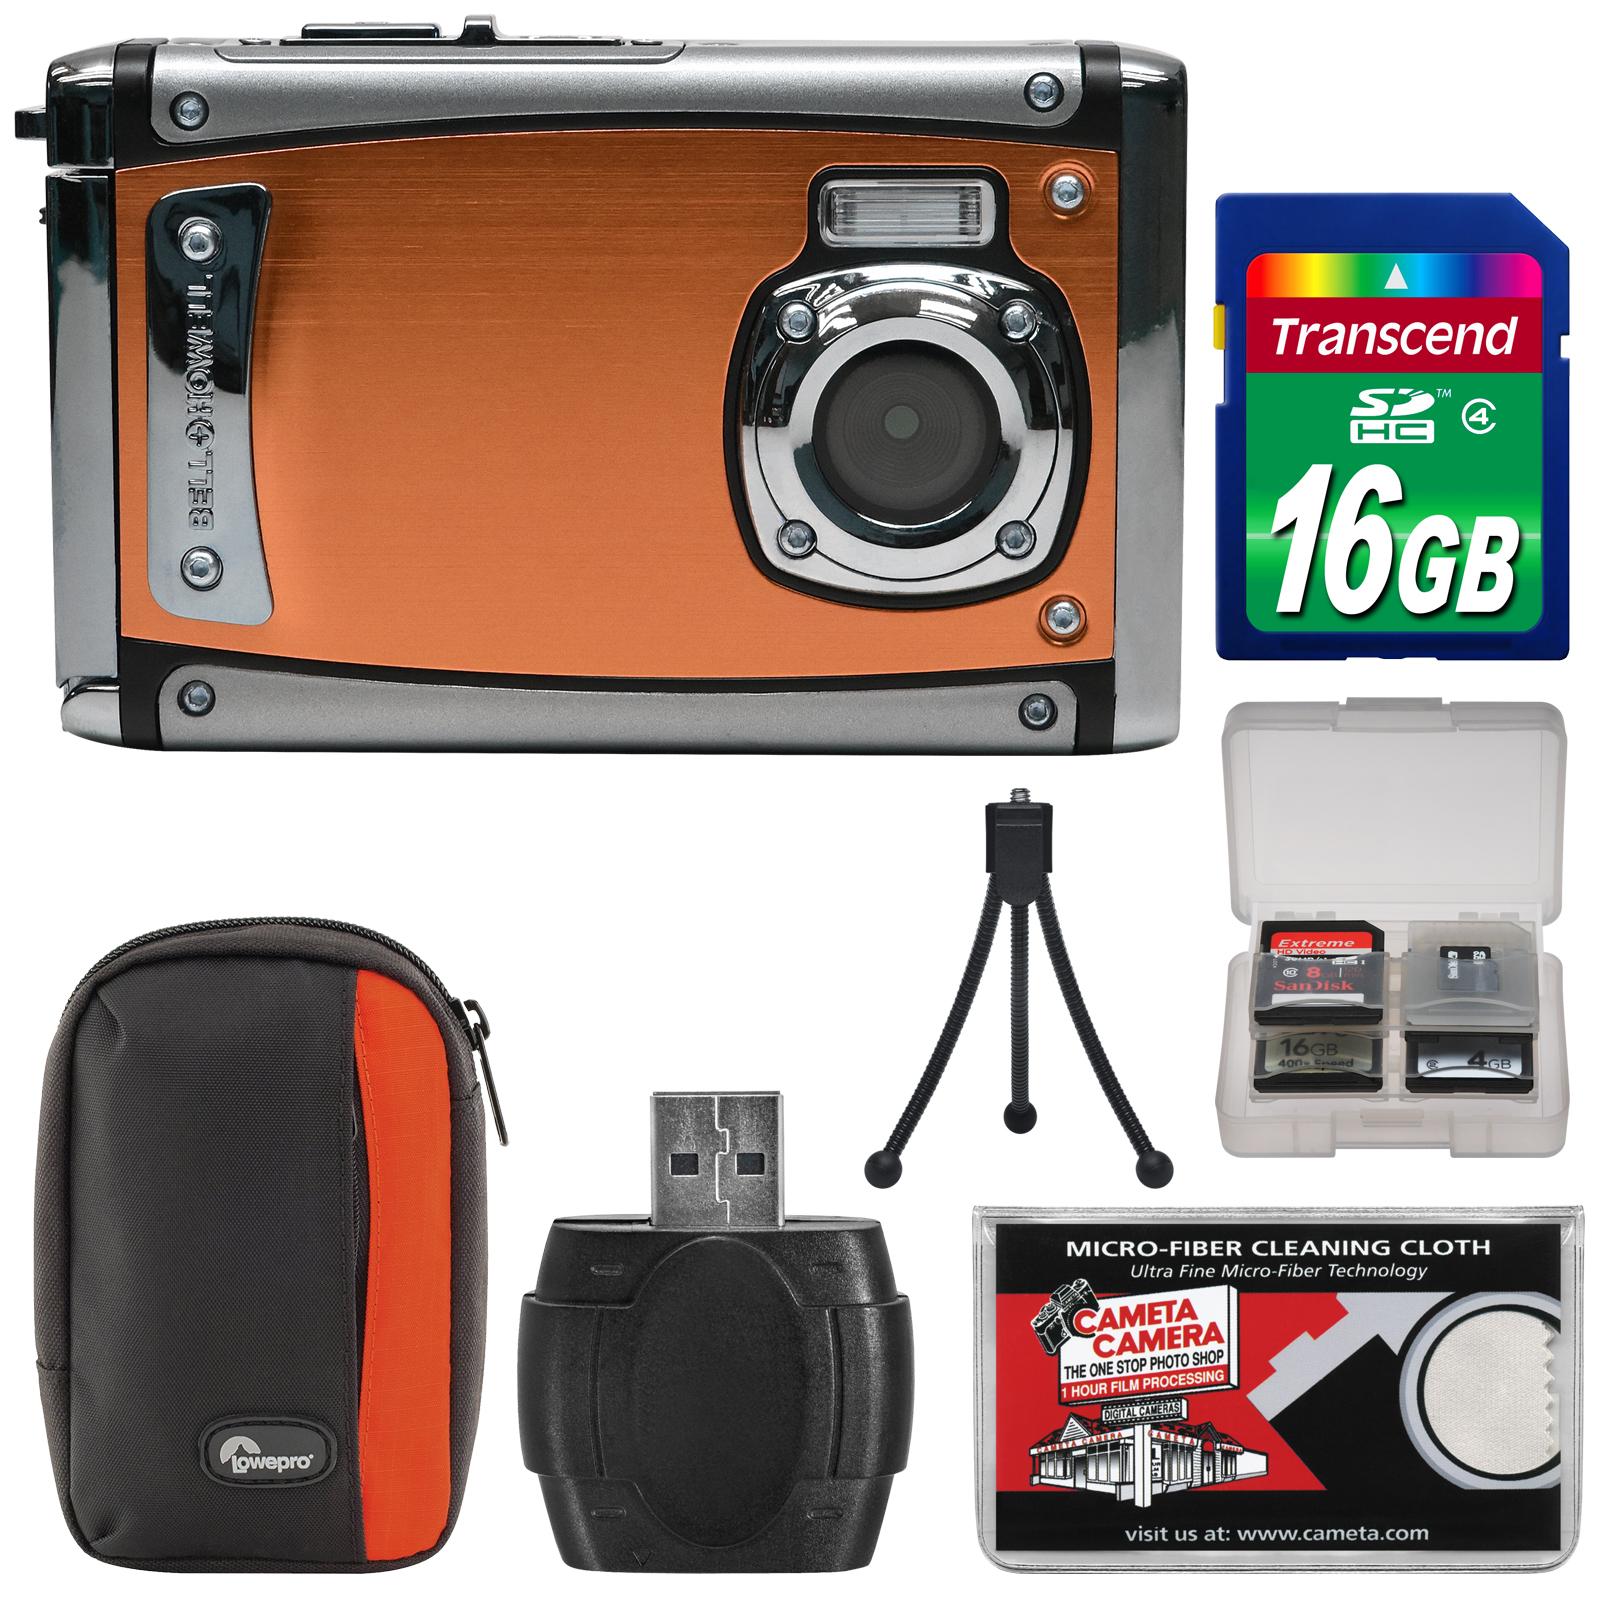 Bell & Howell Splash3 WP20 HD Shock & Waterproof Digital Camera (Blue) with 16GB Card + Case + Reader + Tripod + Kit